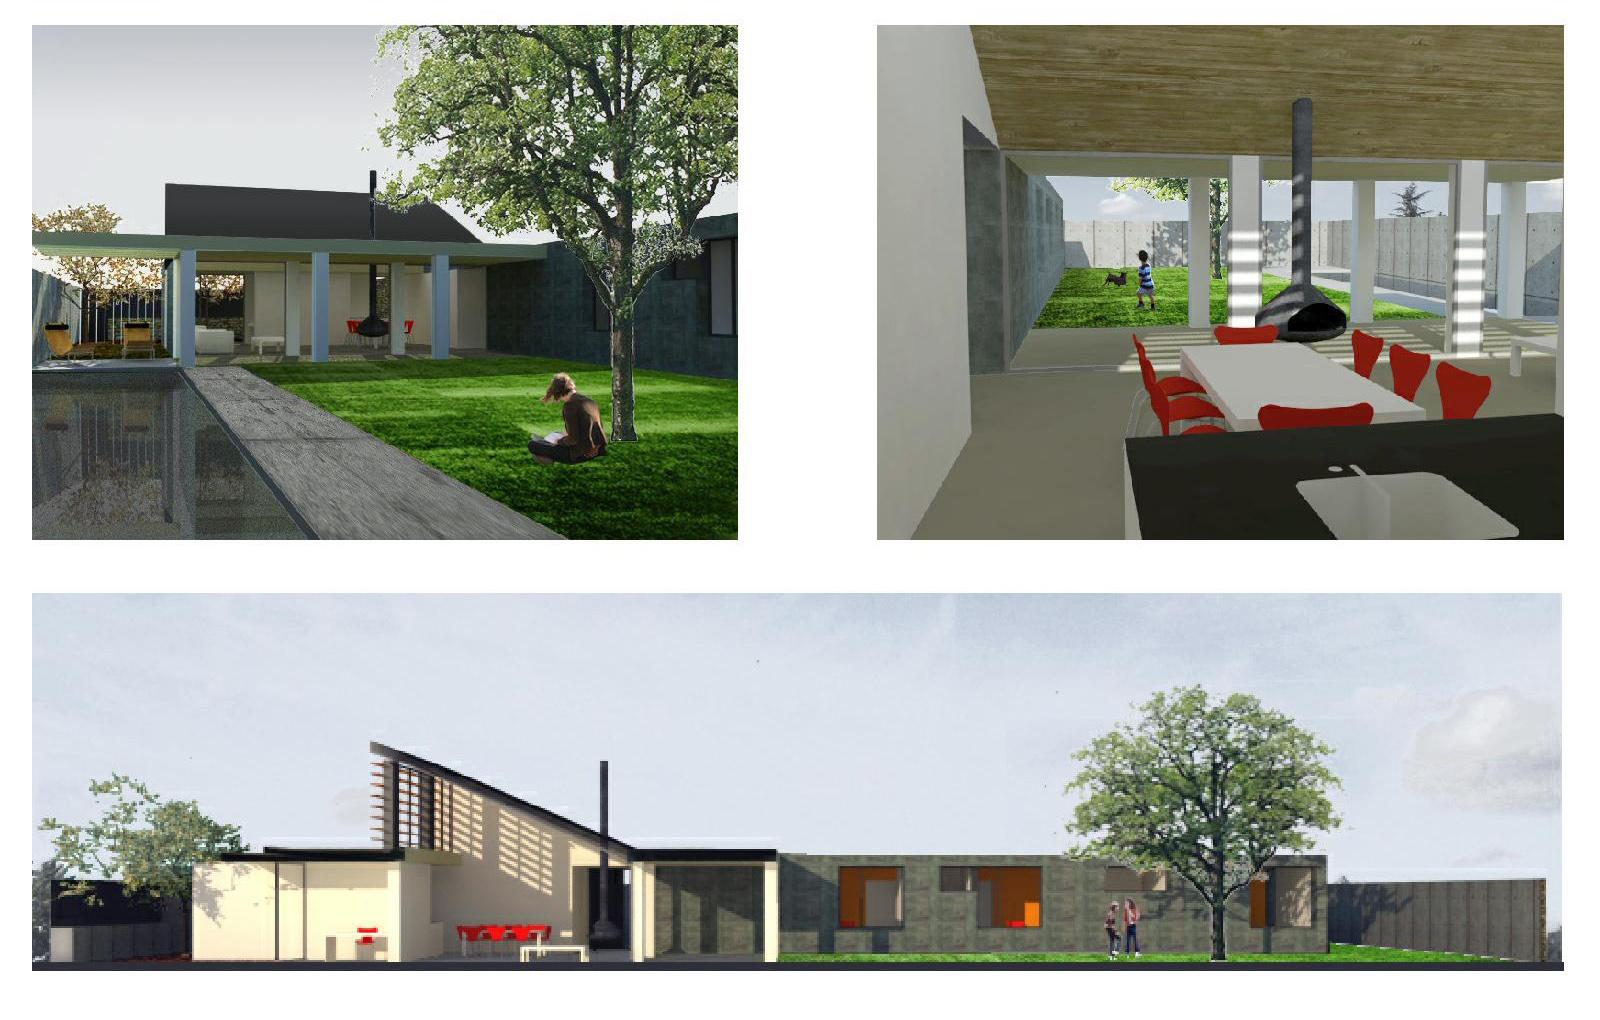 Beriot bernardini arquitectos vivienda unifamiliar at - Vivienda modular hormigon ...